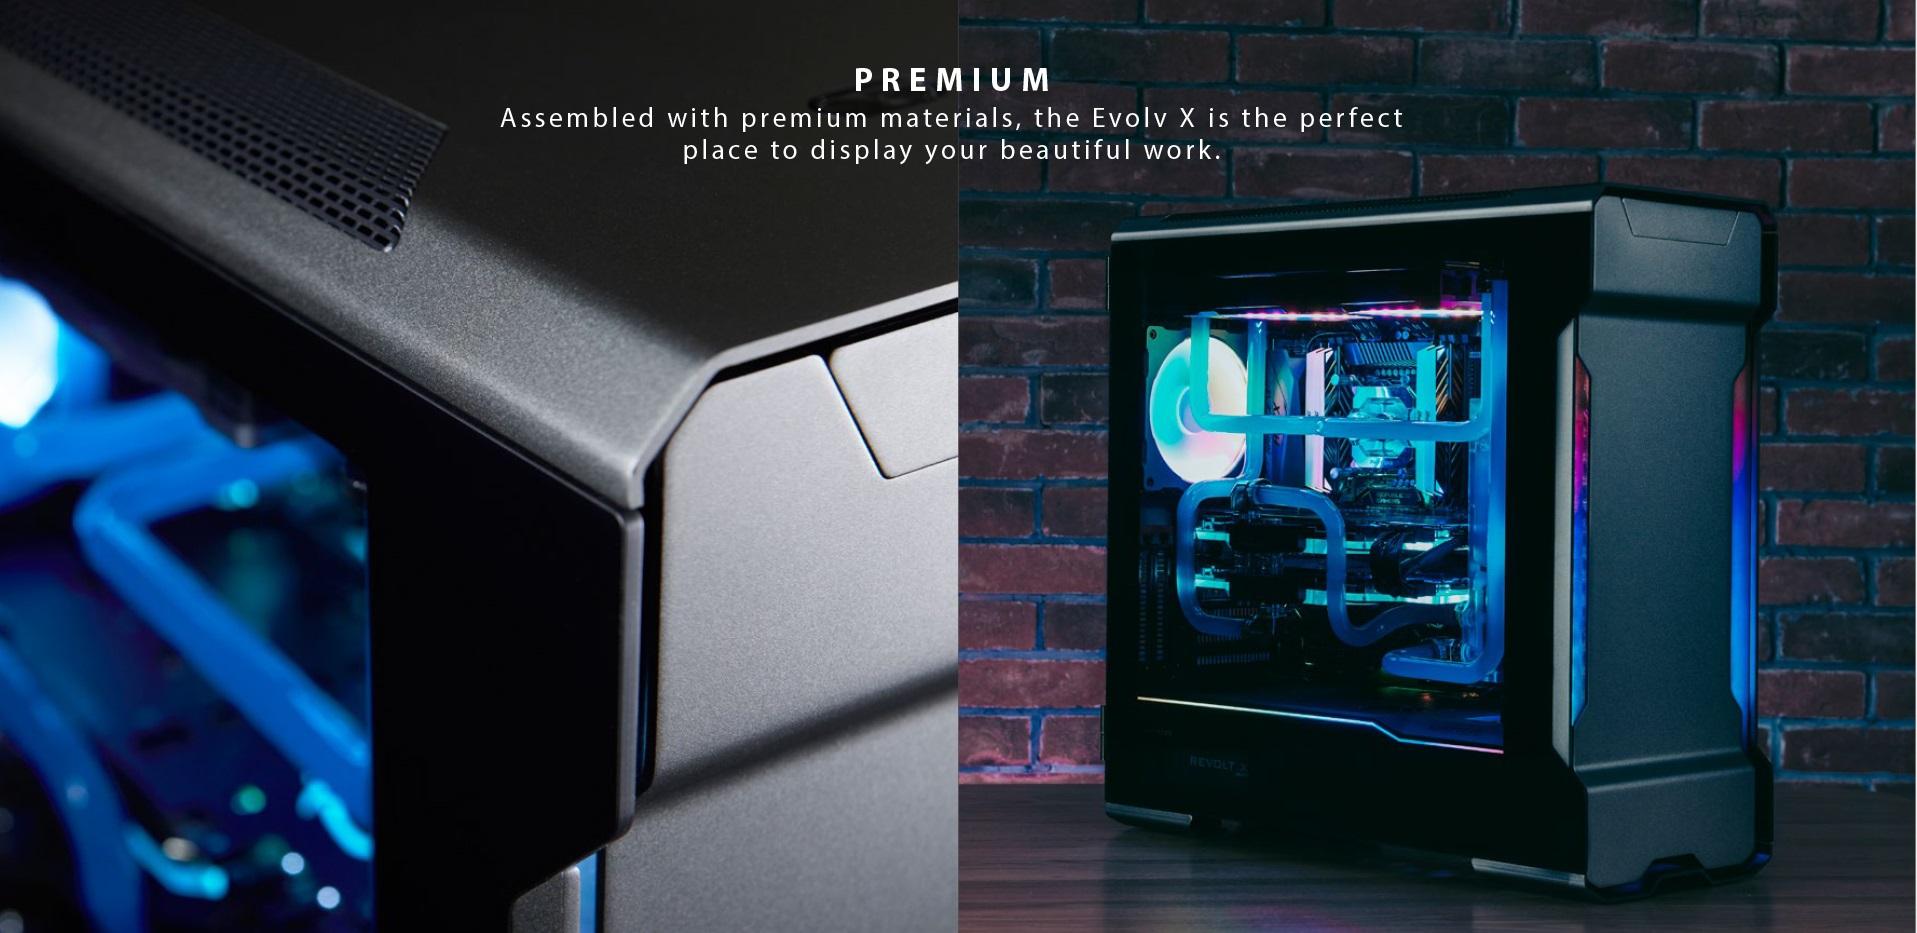 Phanteks Enthoo Evolv X ATX Case, Tempered Glass Window - Black tổng quan 2